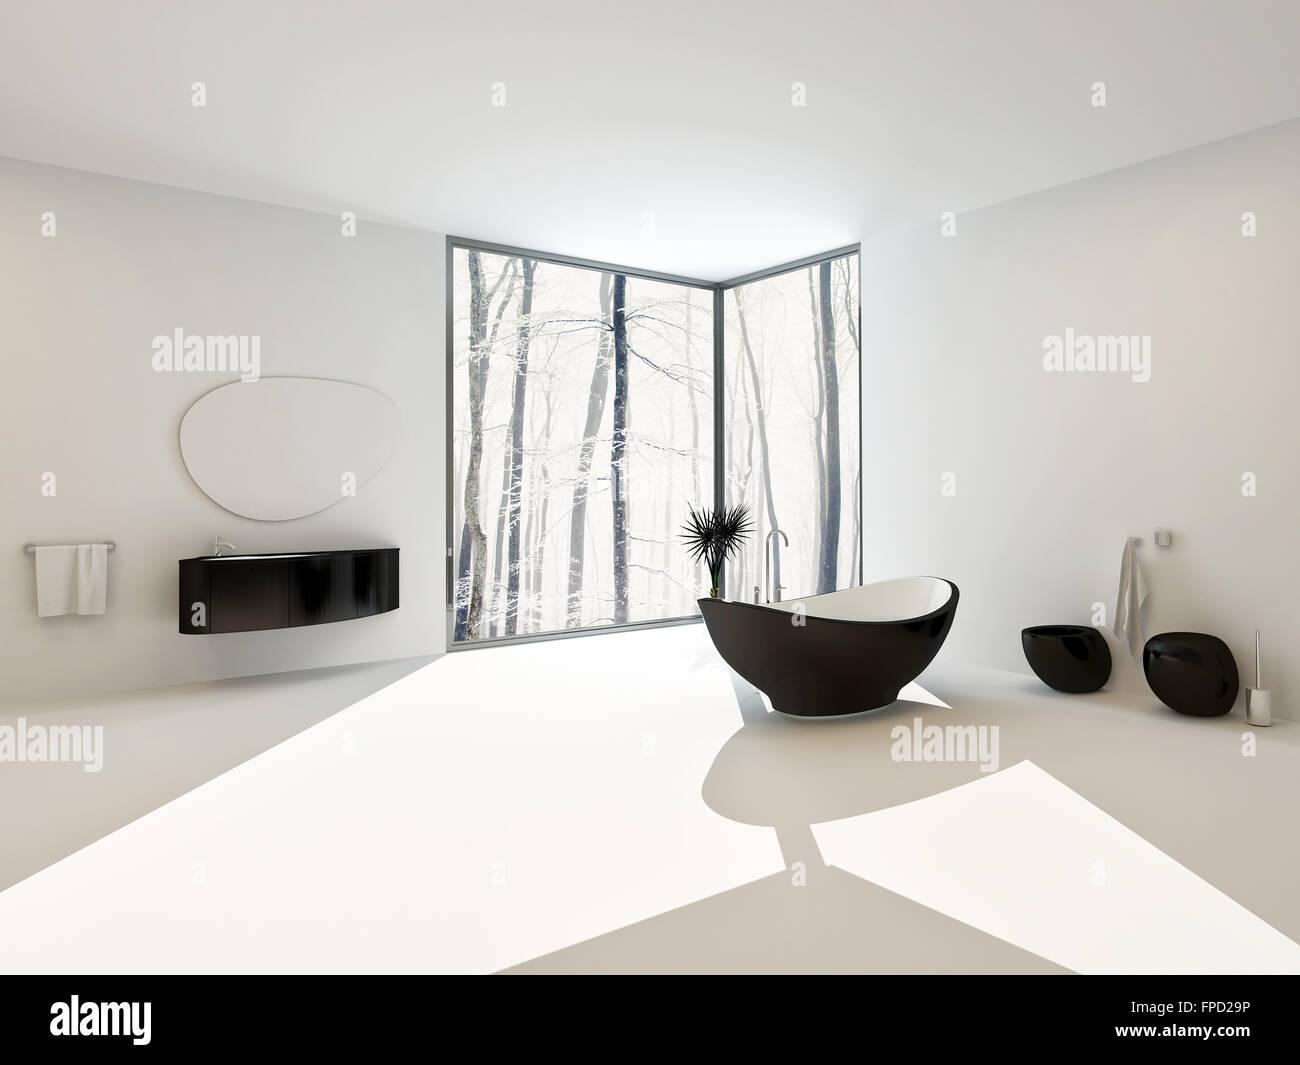 luxury spacious airy bright white modern bathroom interior with black boat shaped bathtub and matching vanity toilet and bidet - Black Luxury Modern Bathroom